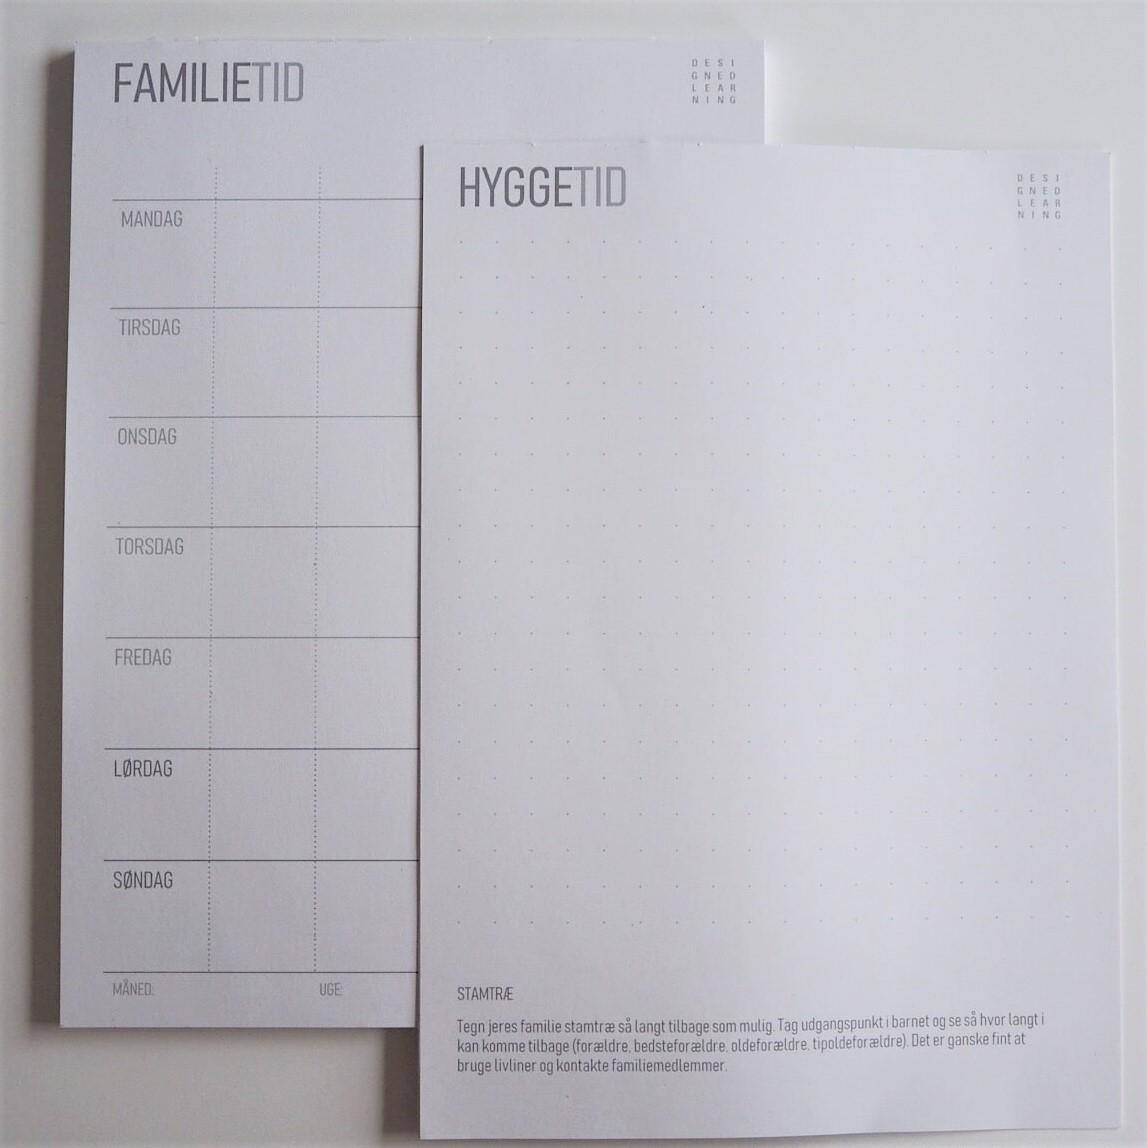 Familietid, Hyggetid, Kalender